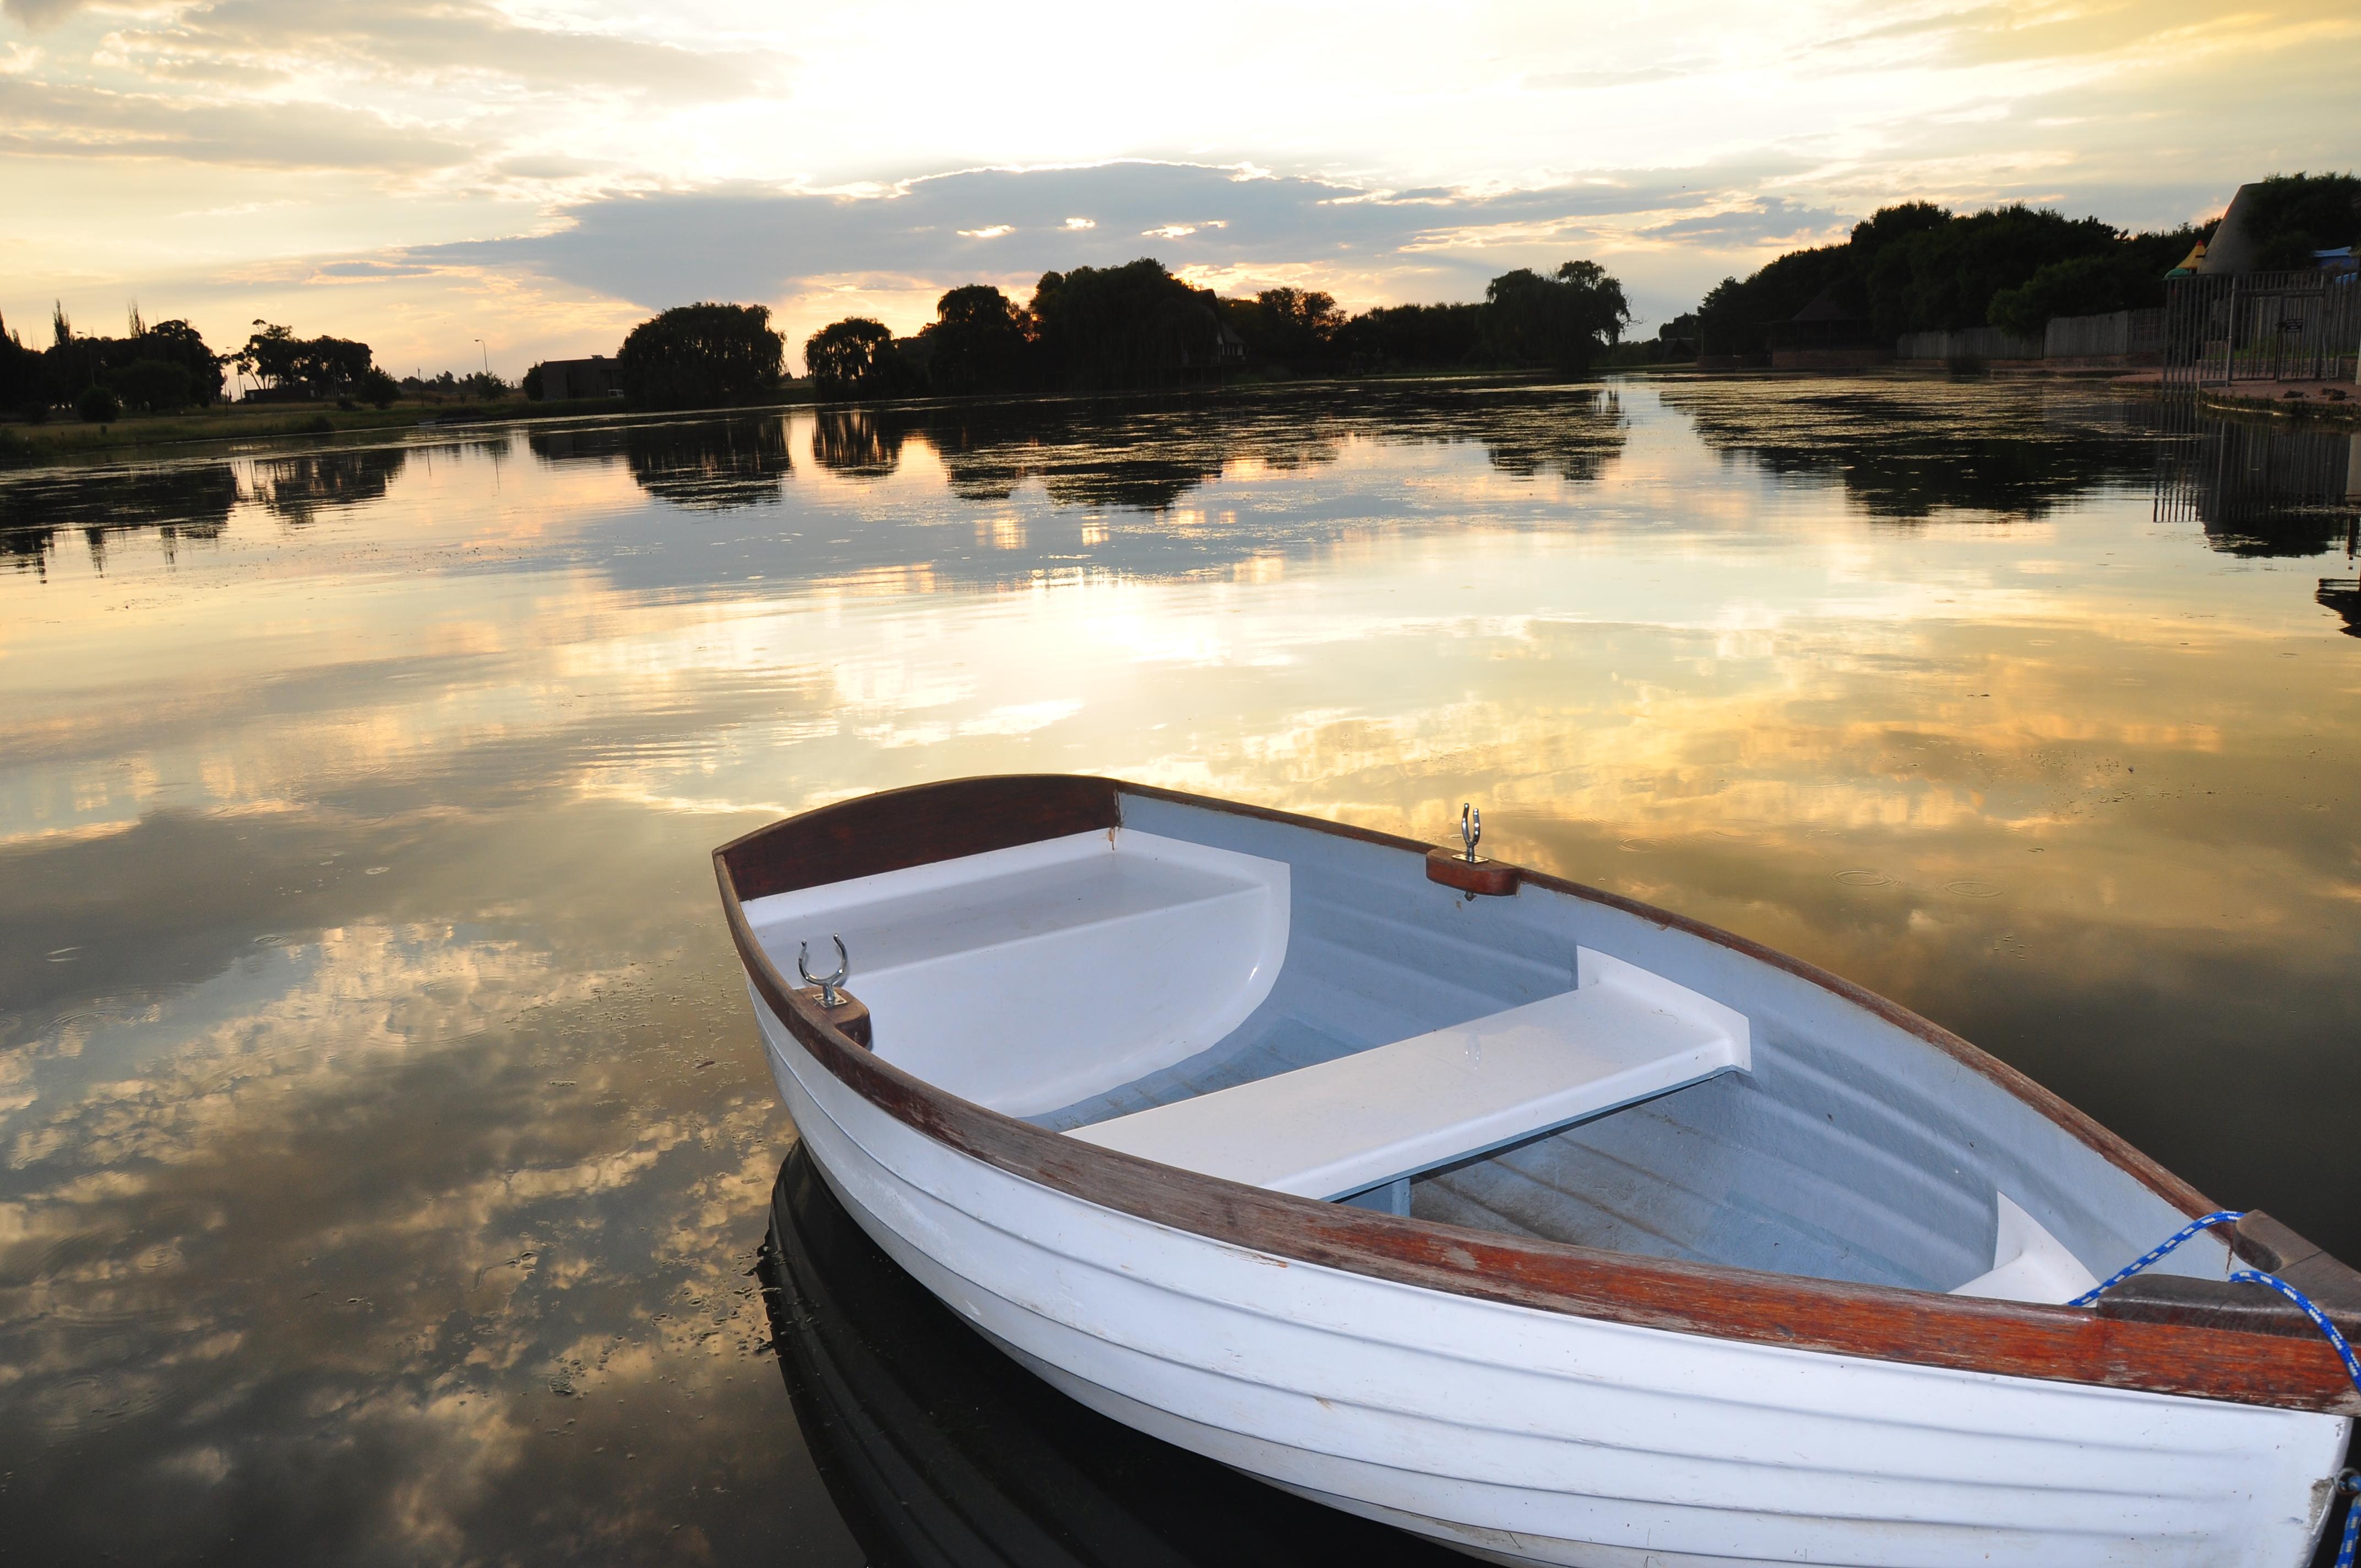 Rowing on Lake Umuzi (Rocky Waters)